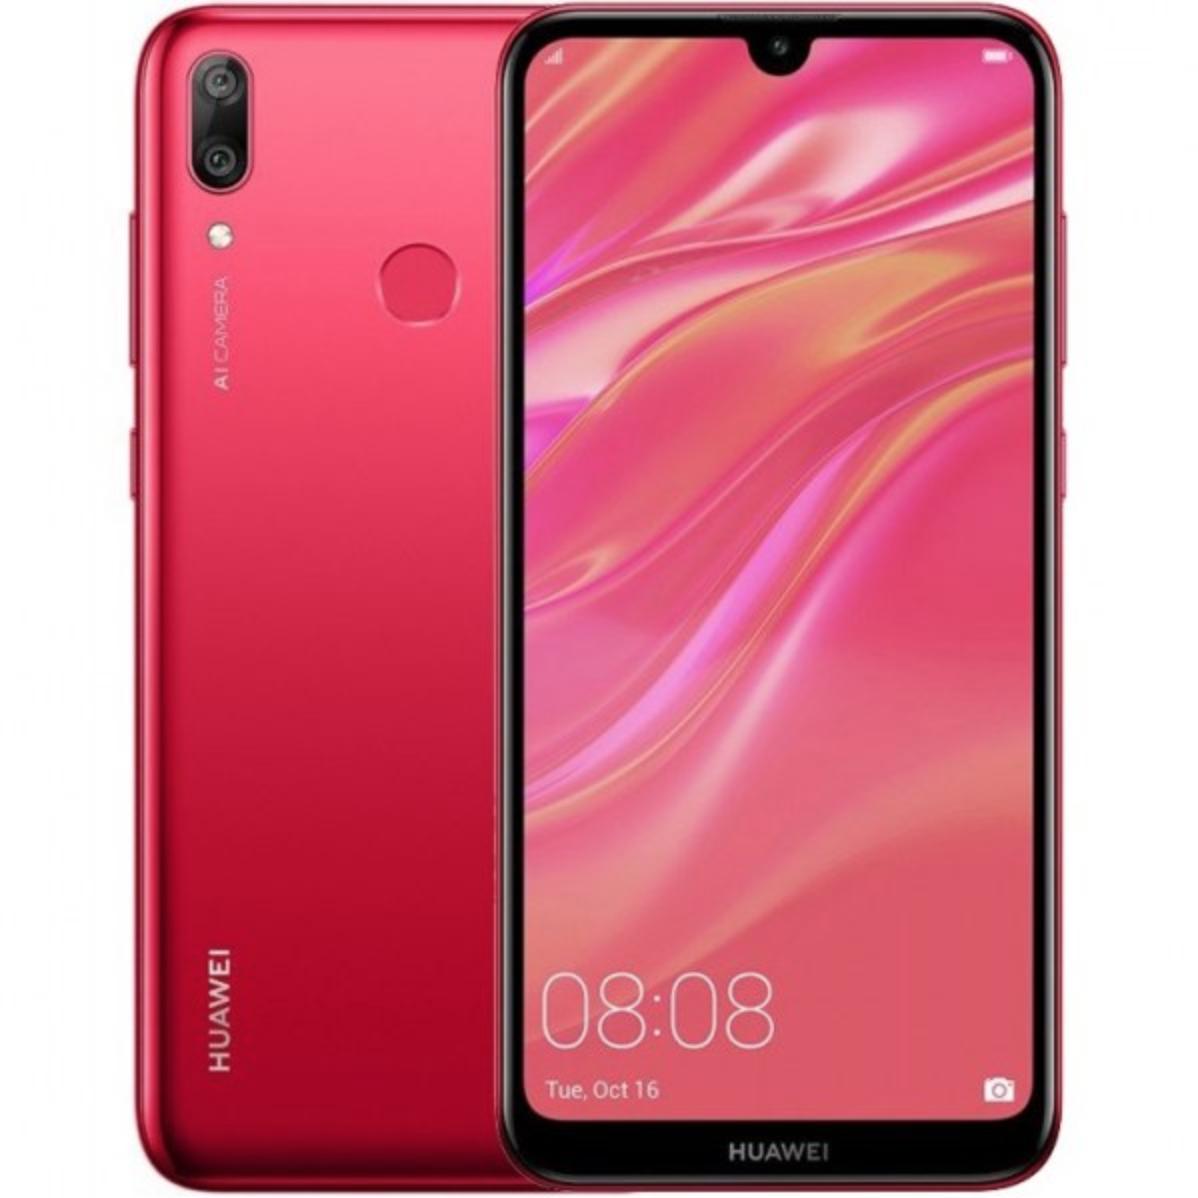 Huawei Y7 Pro 2019 3GB/32GB Dual Sim Red - £117.99 - eglobalcentraluk